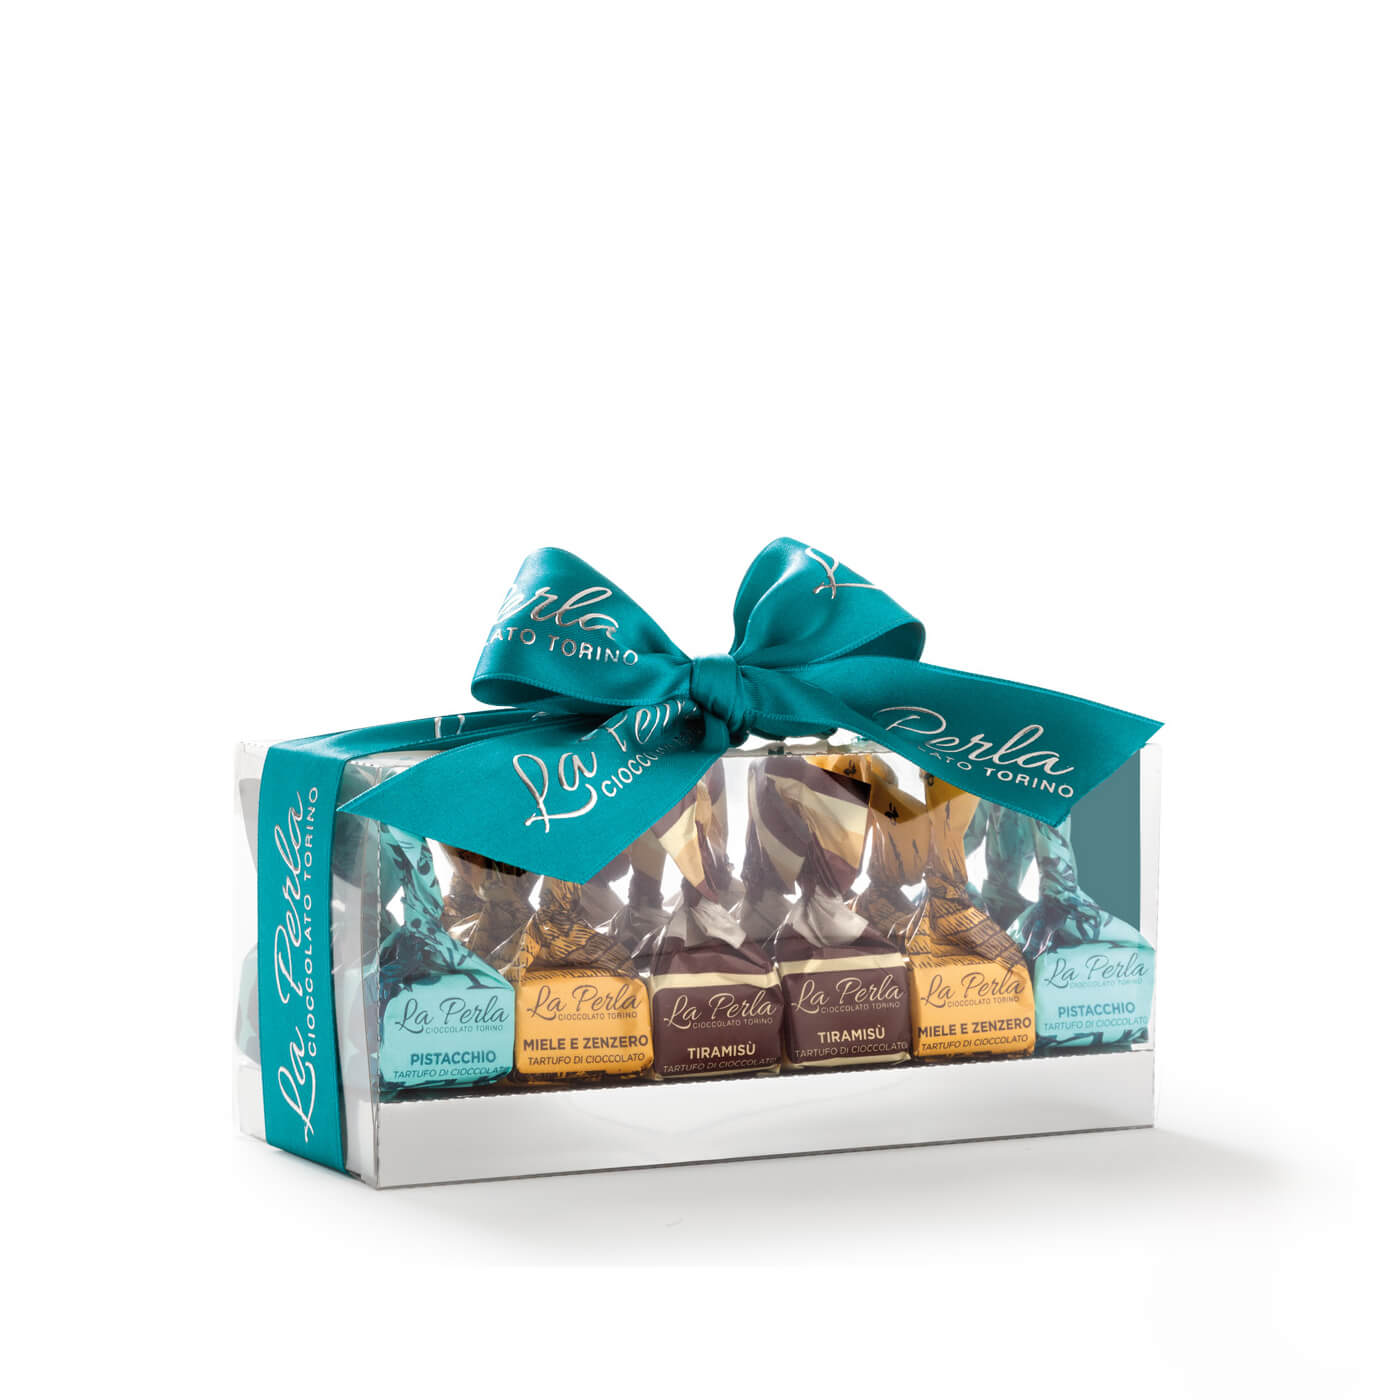 La Perla Tiramisu, Honey Ginger and Pistachio Truffles 260g